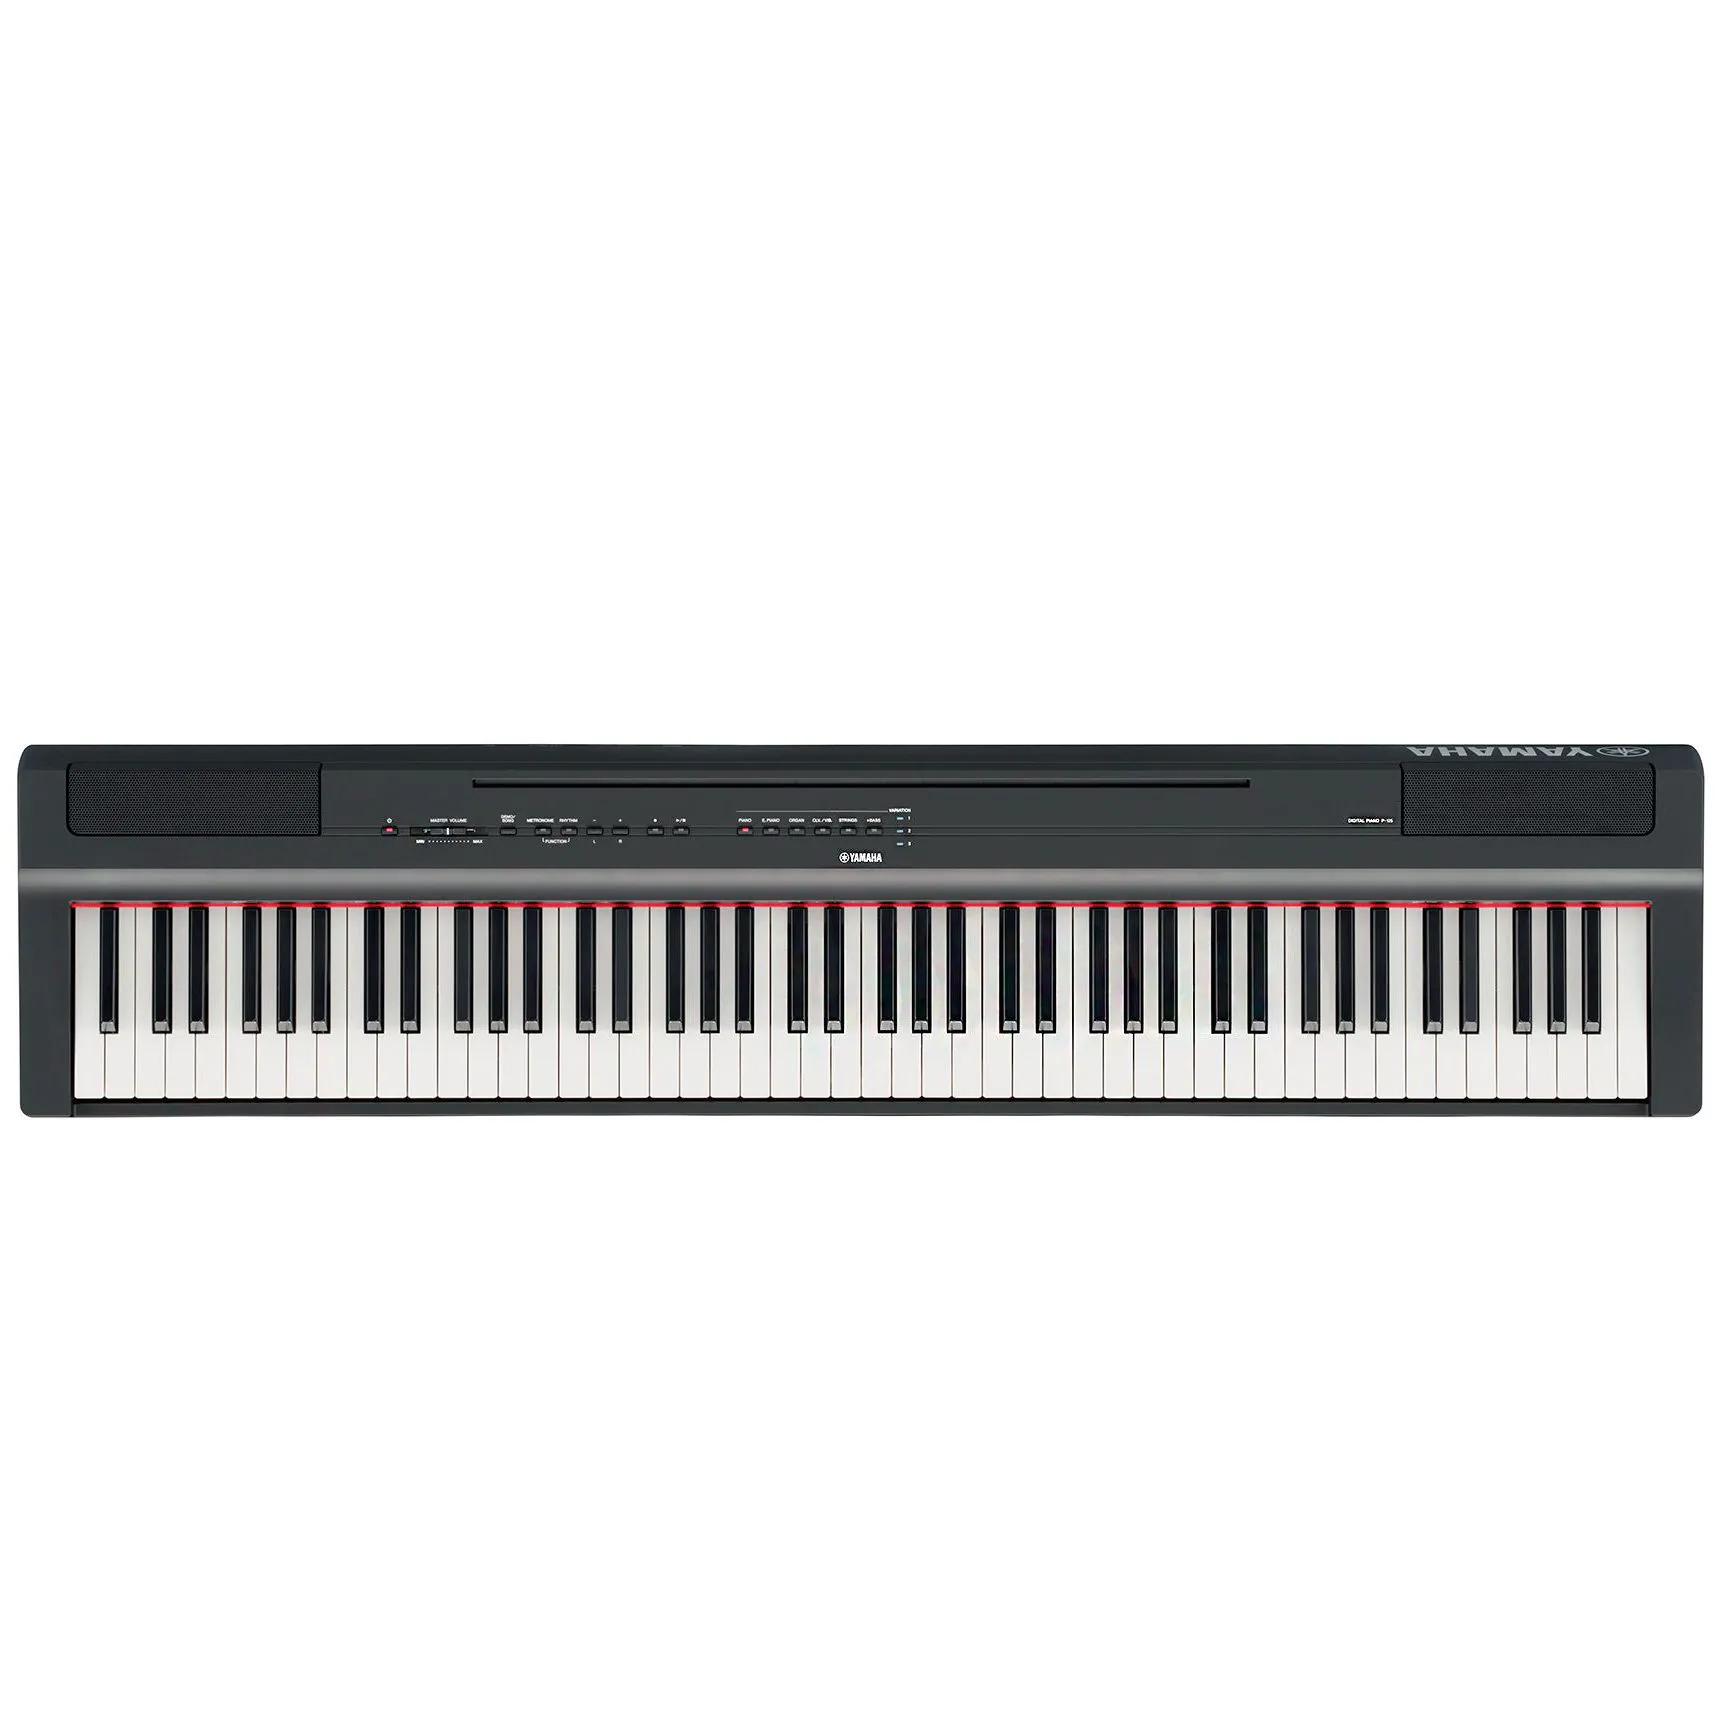 Piano Digital Yamaha P125 88 Teclas USB Black